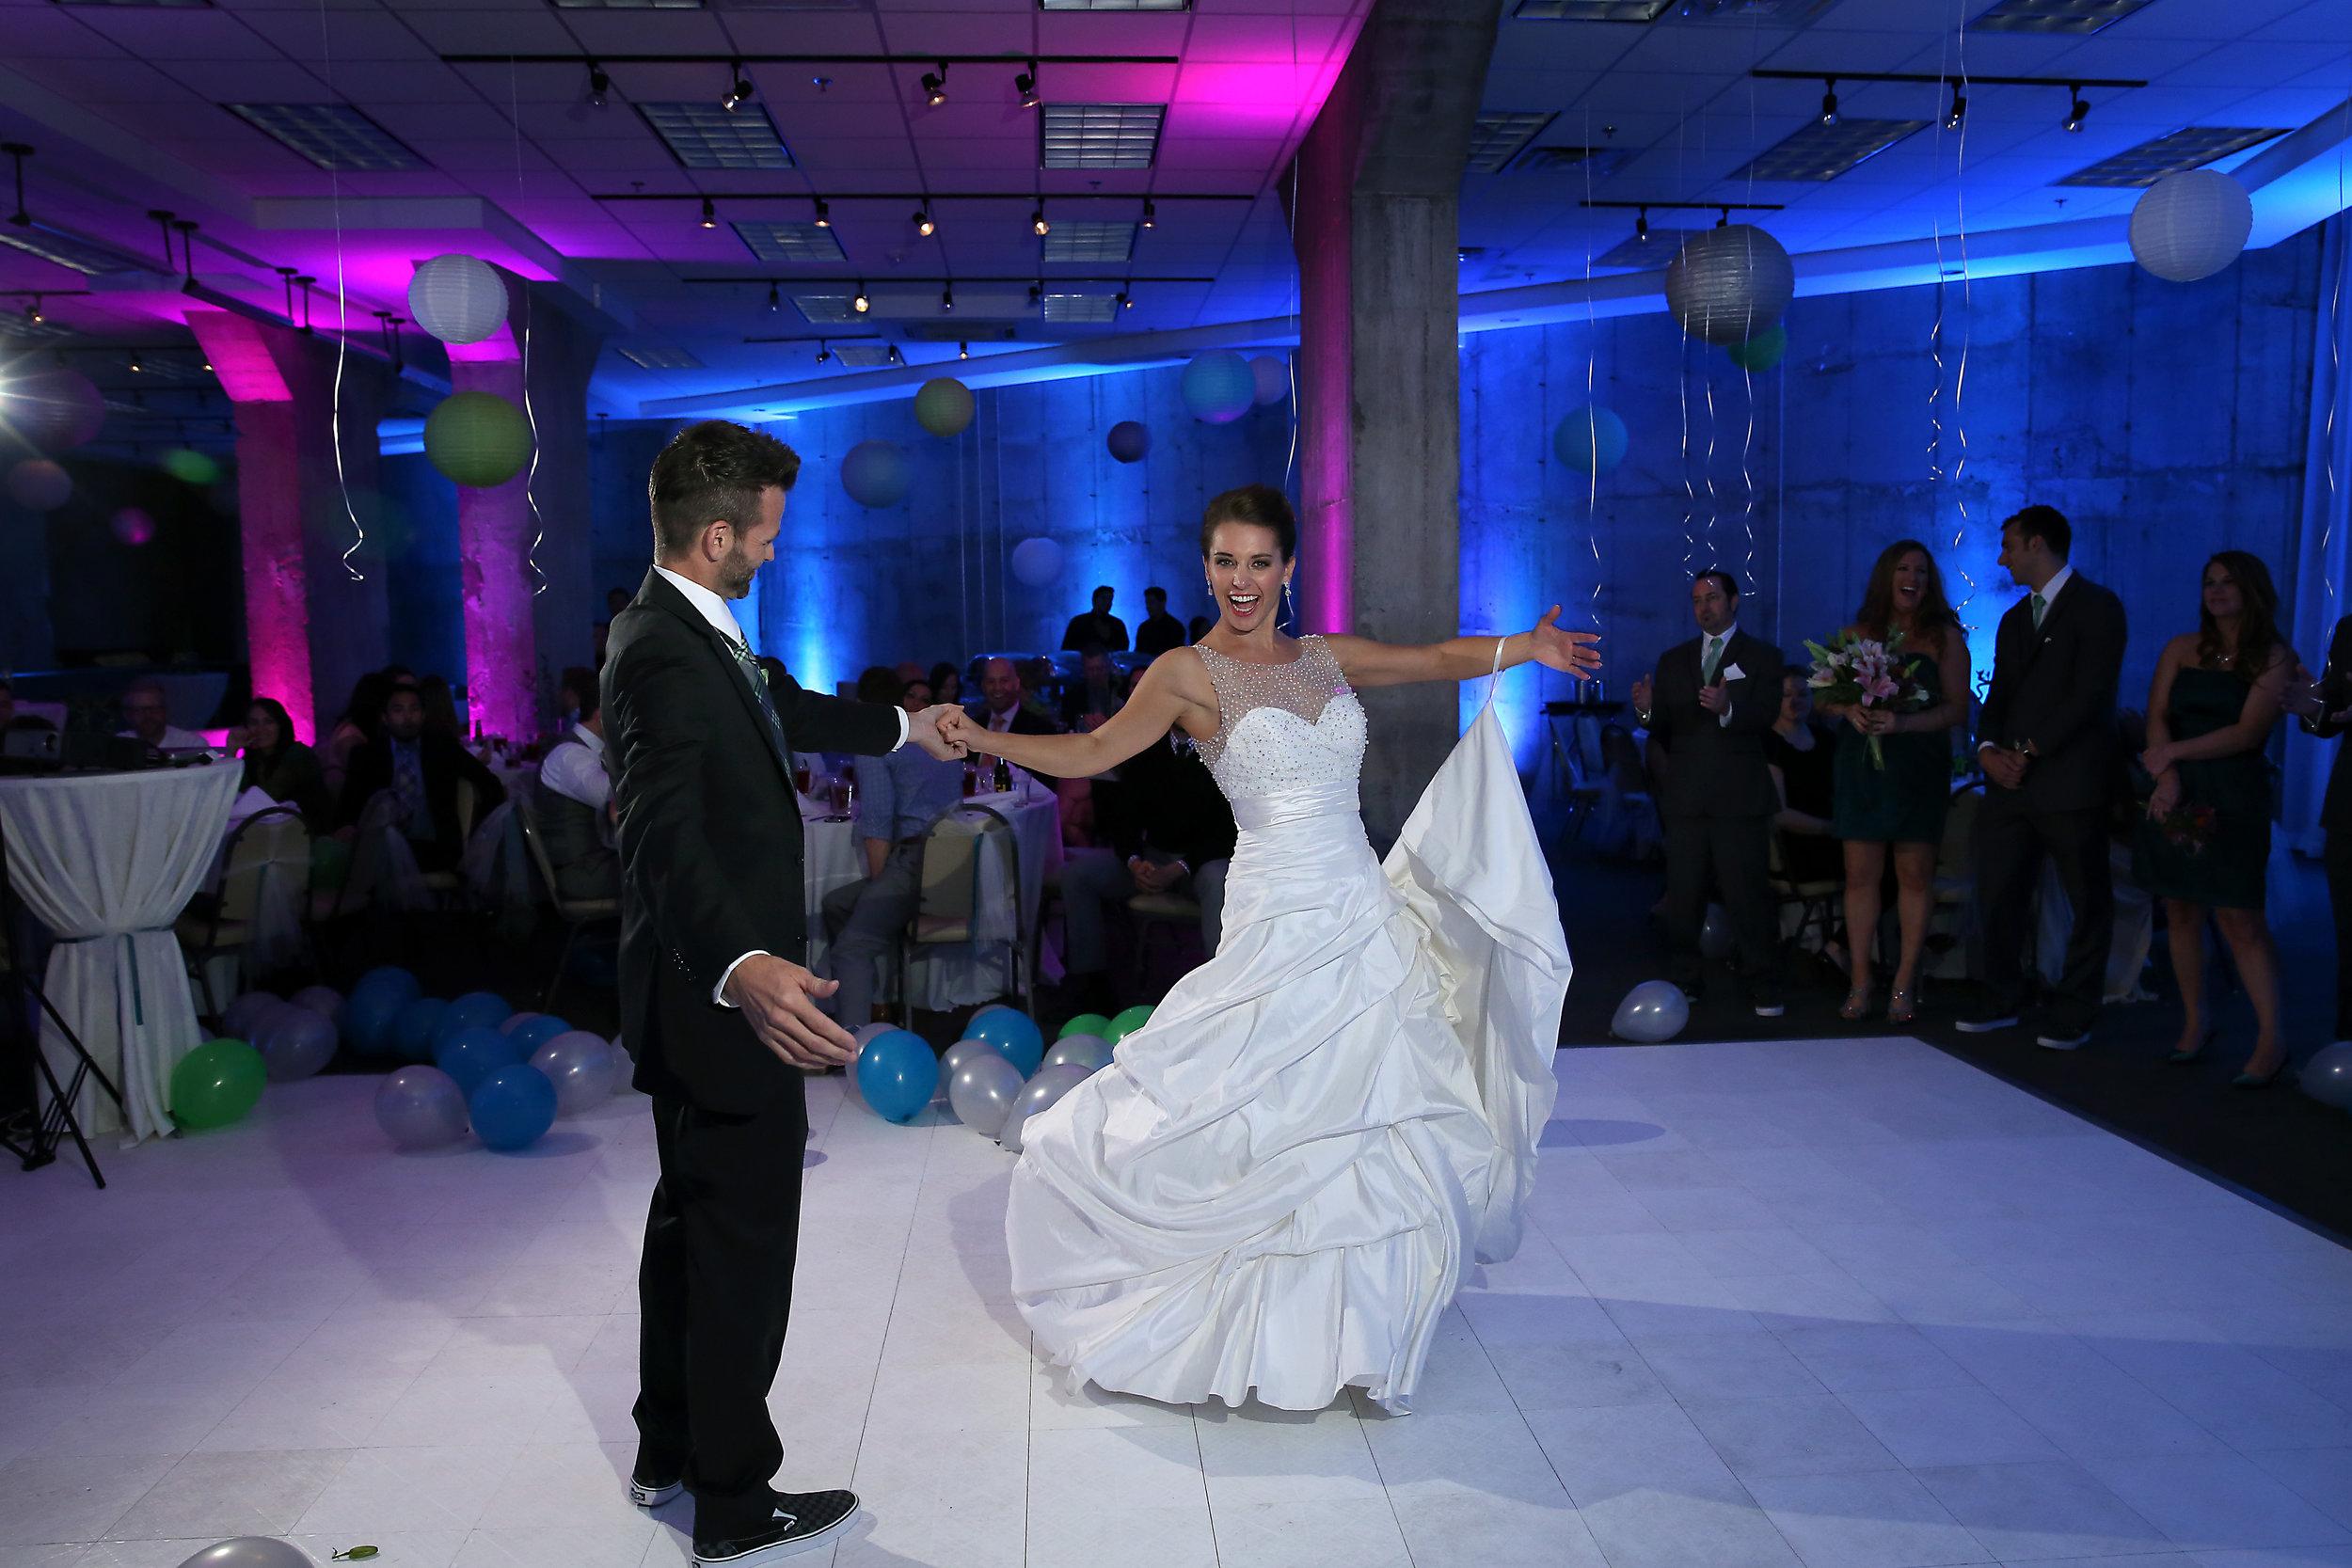 Bride-Groom-Dance-Dallas-Wedding-Reception-DJ-Aloft.jpg